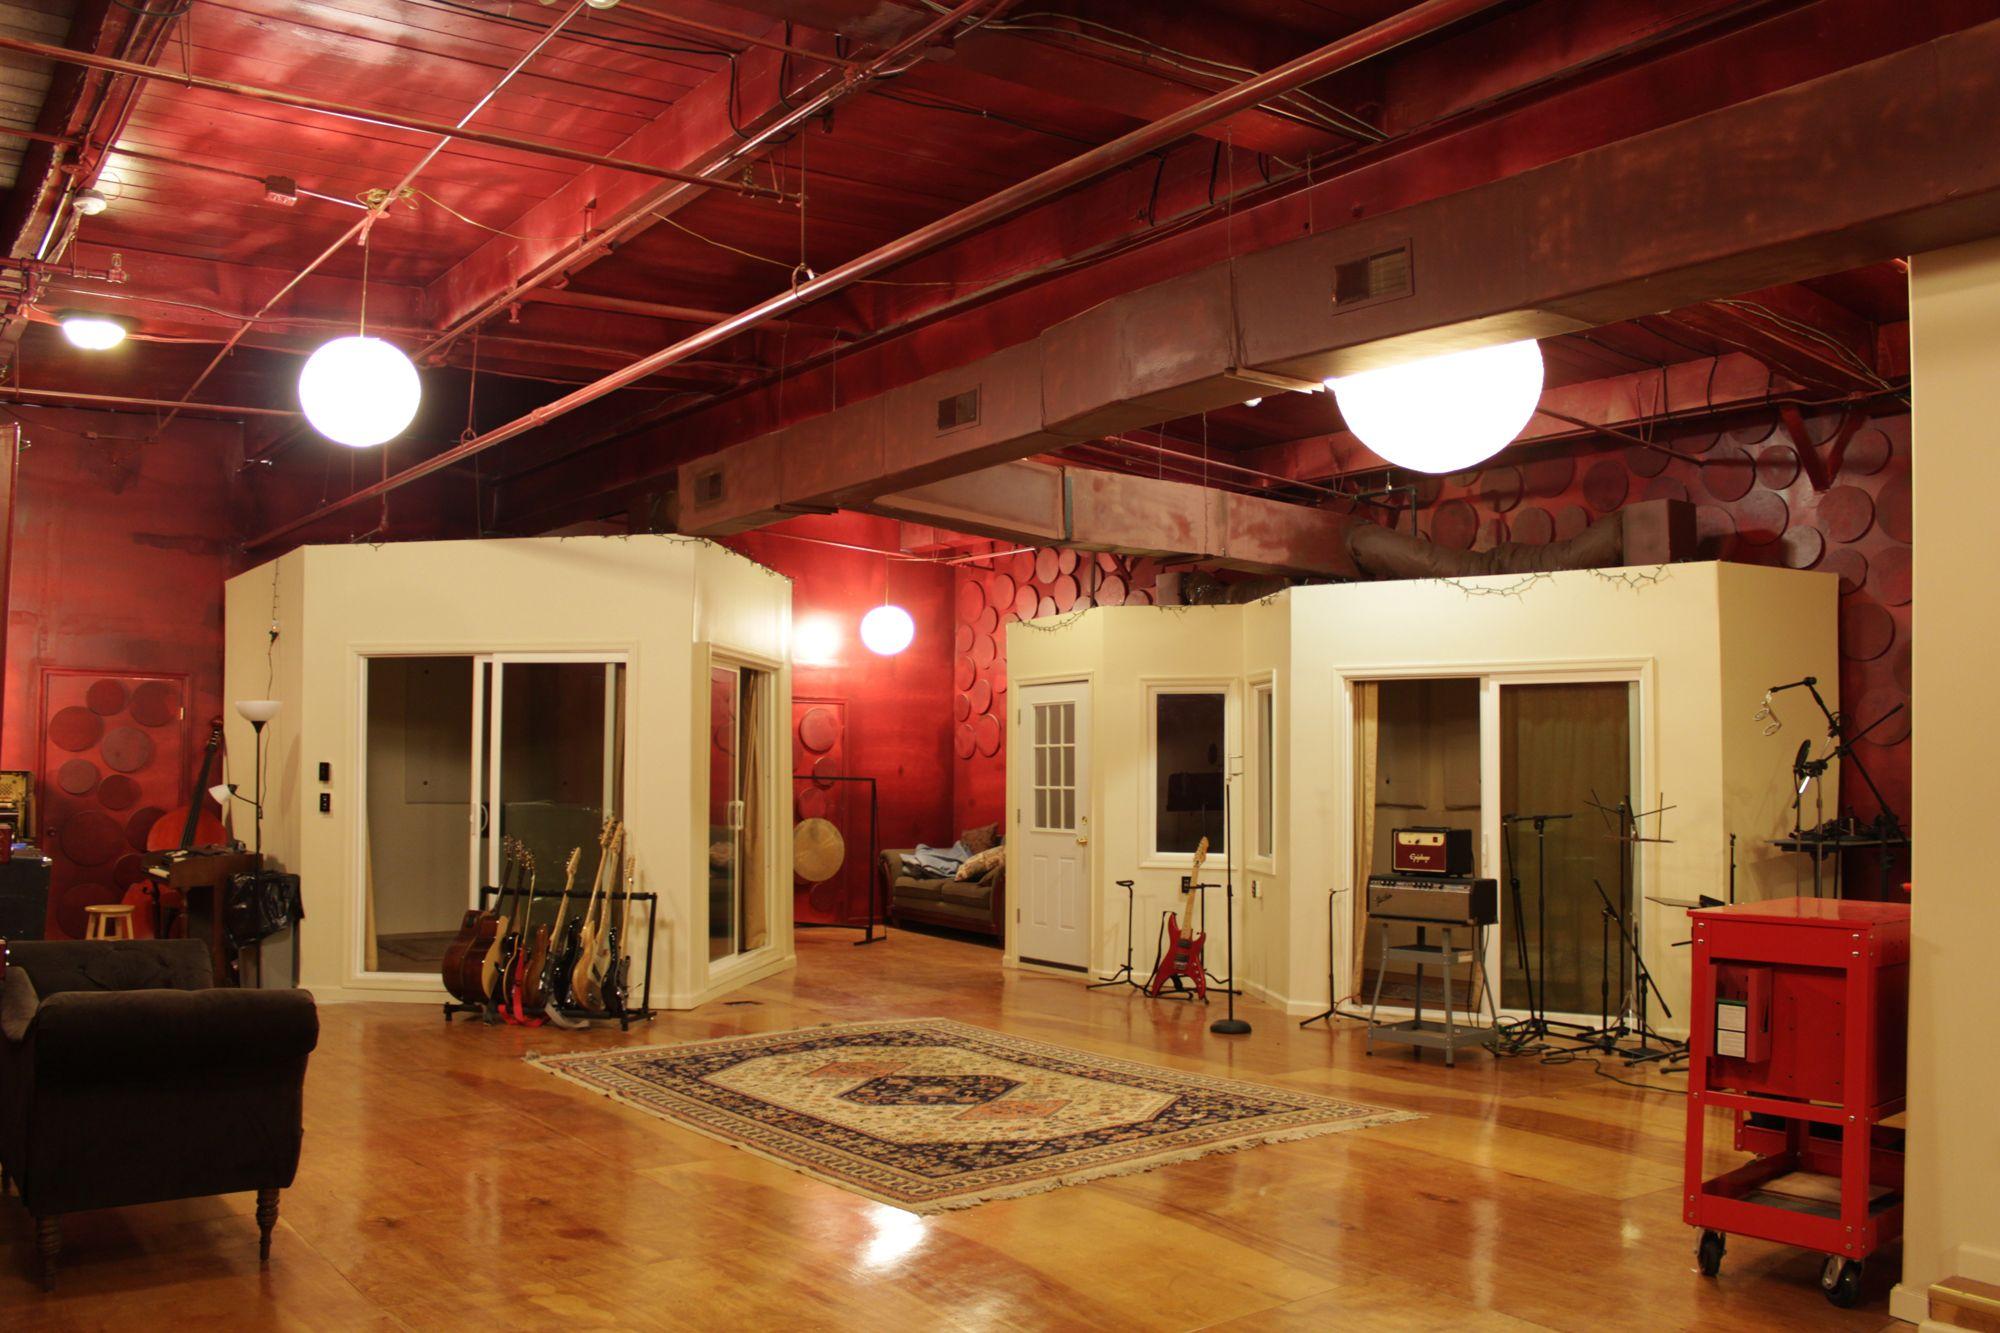 open live room recording studio pinterest open live studio and room ForRecording Studio Live Room Design